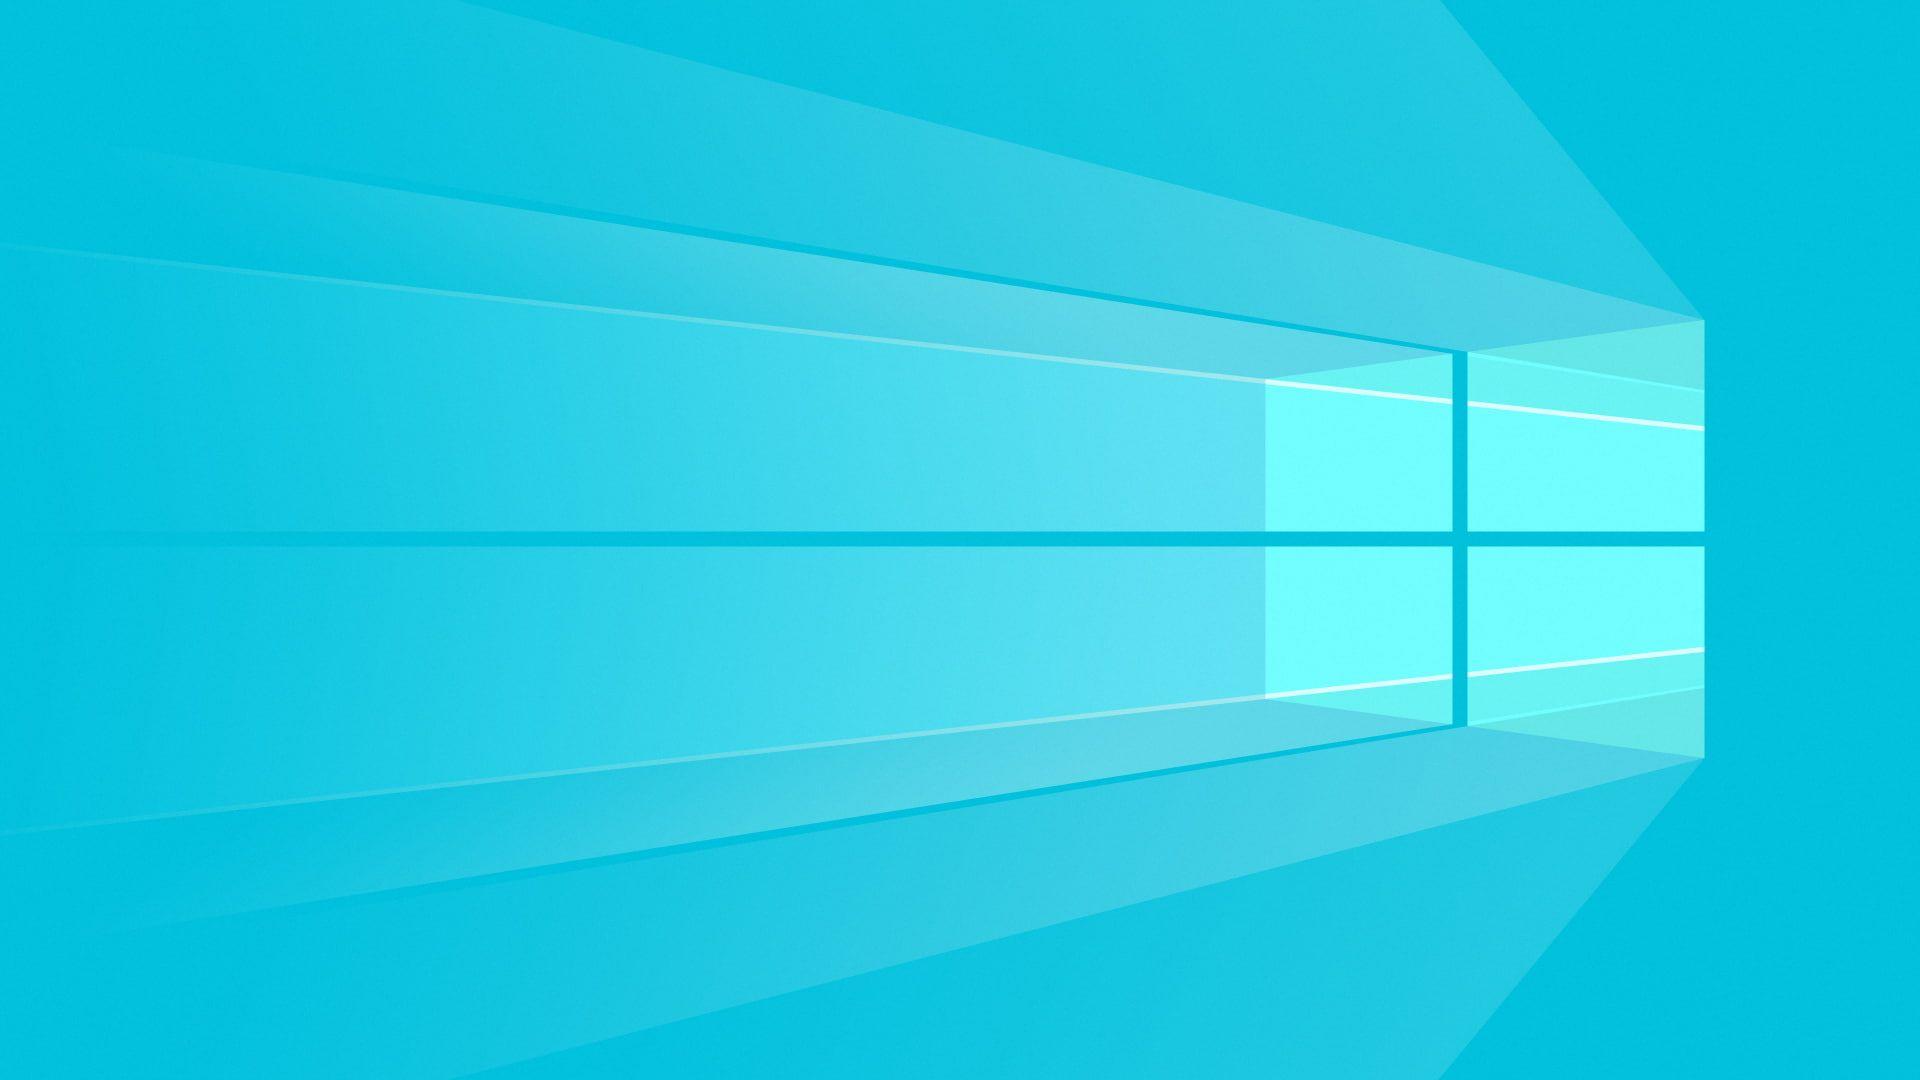 Windows 10 Blue Desktop Wallpaper